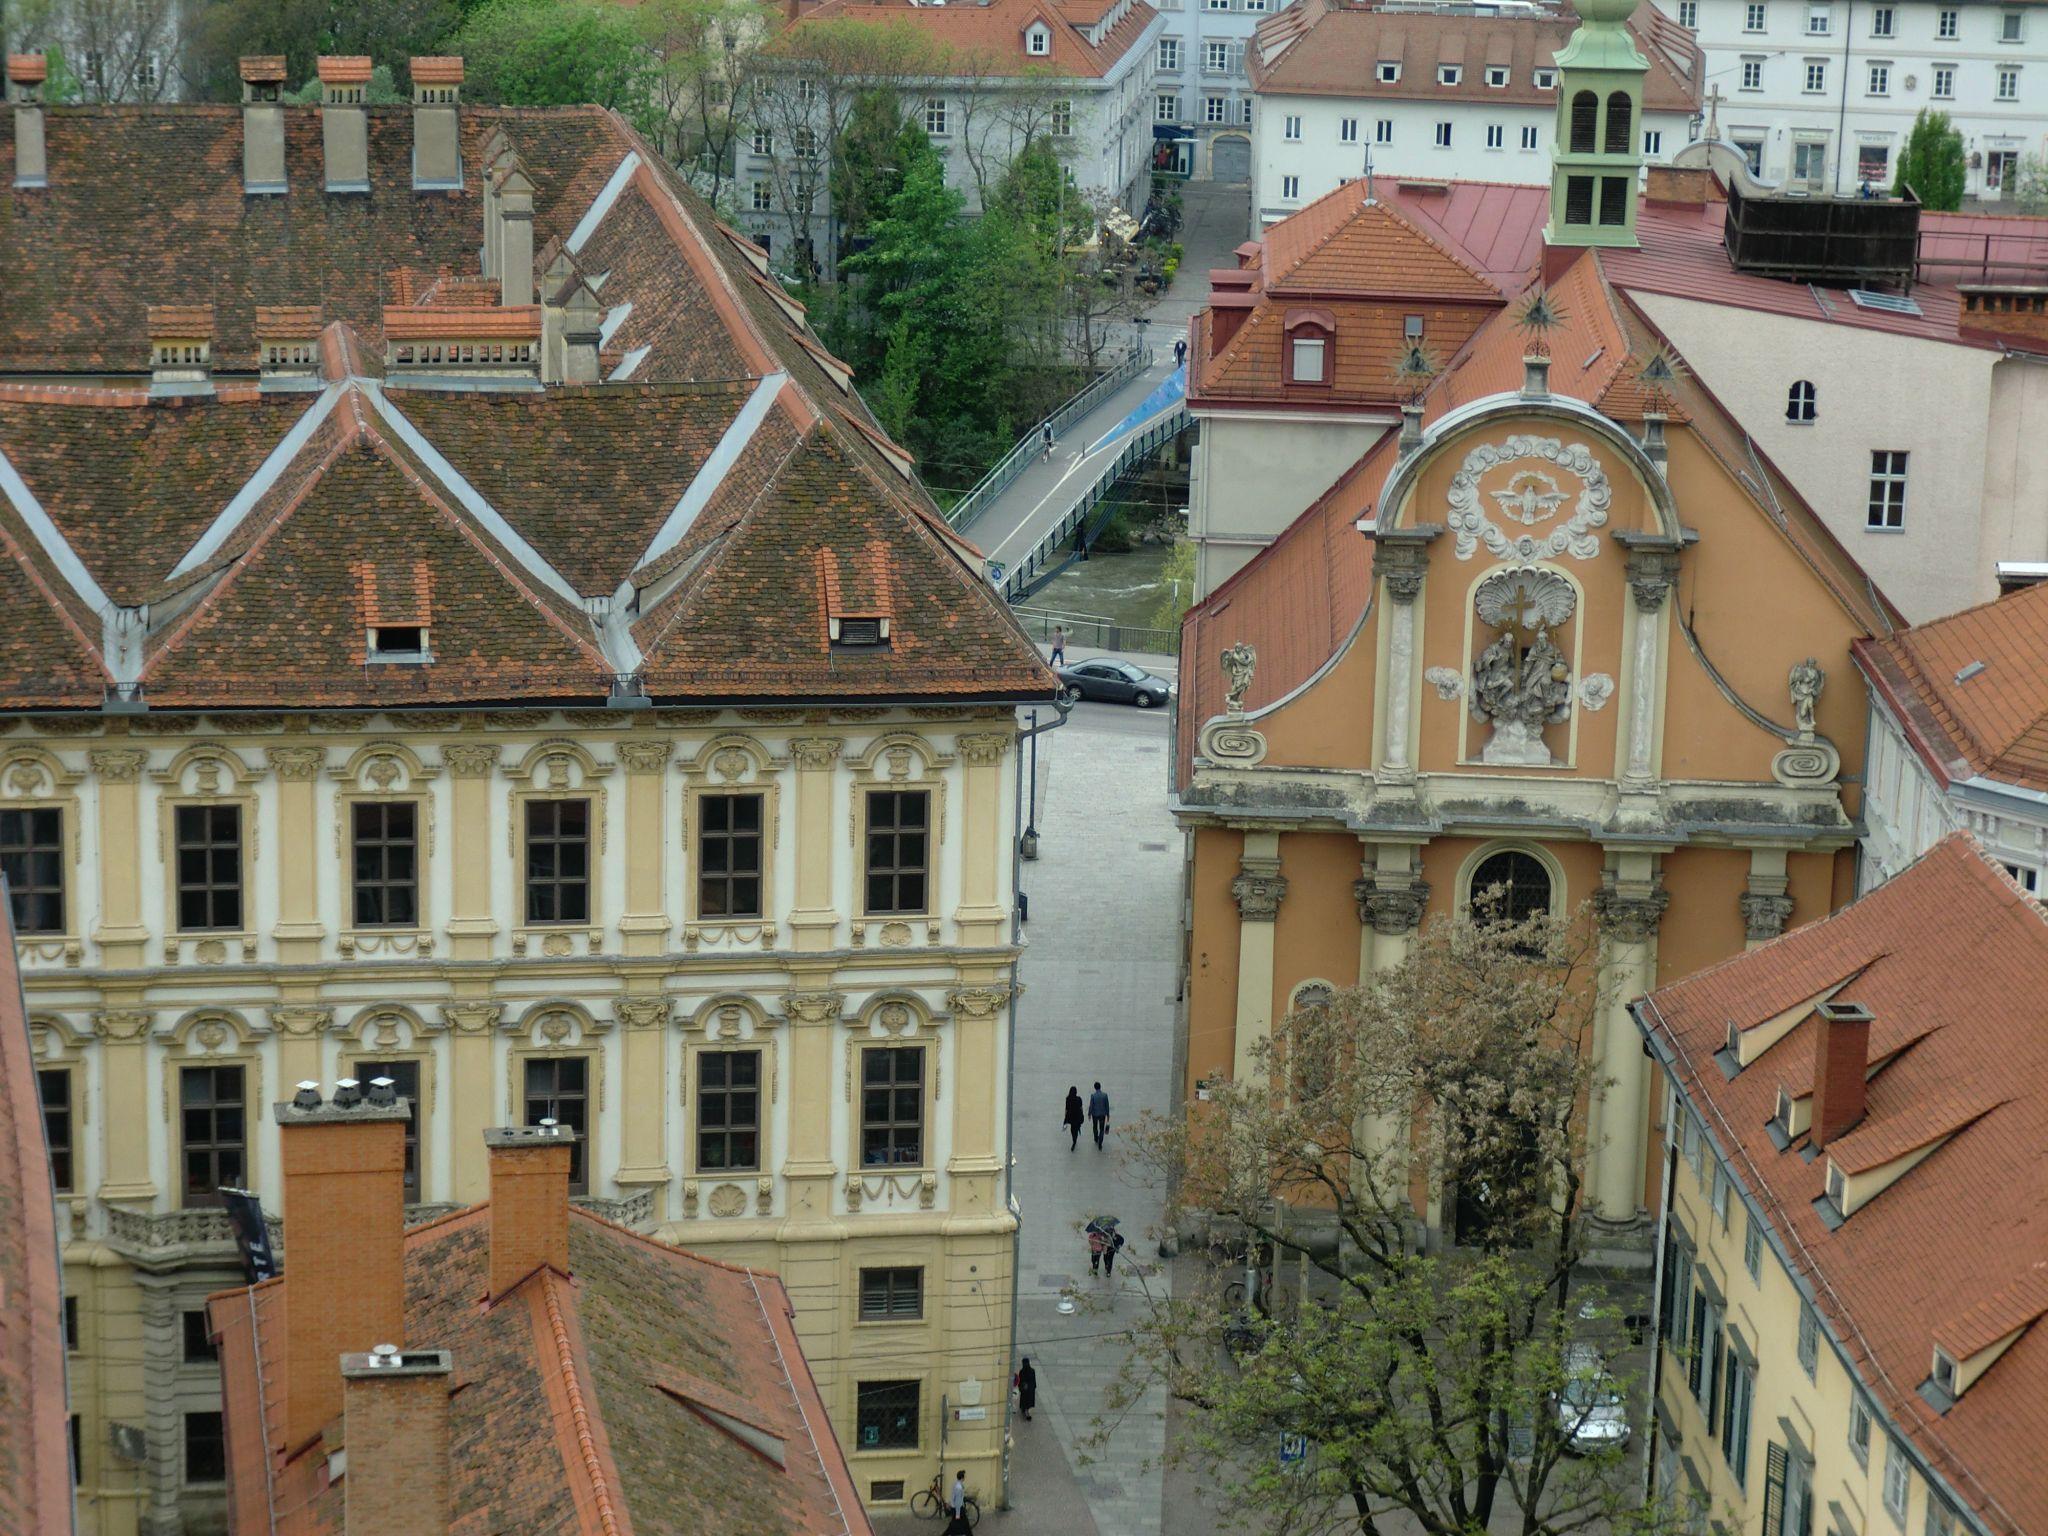 Graz view 5 - Graz: tradition and modernity